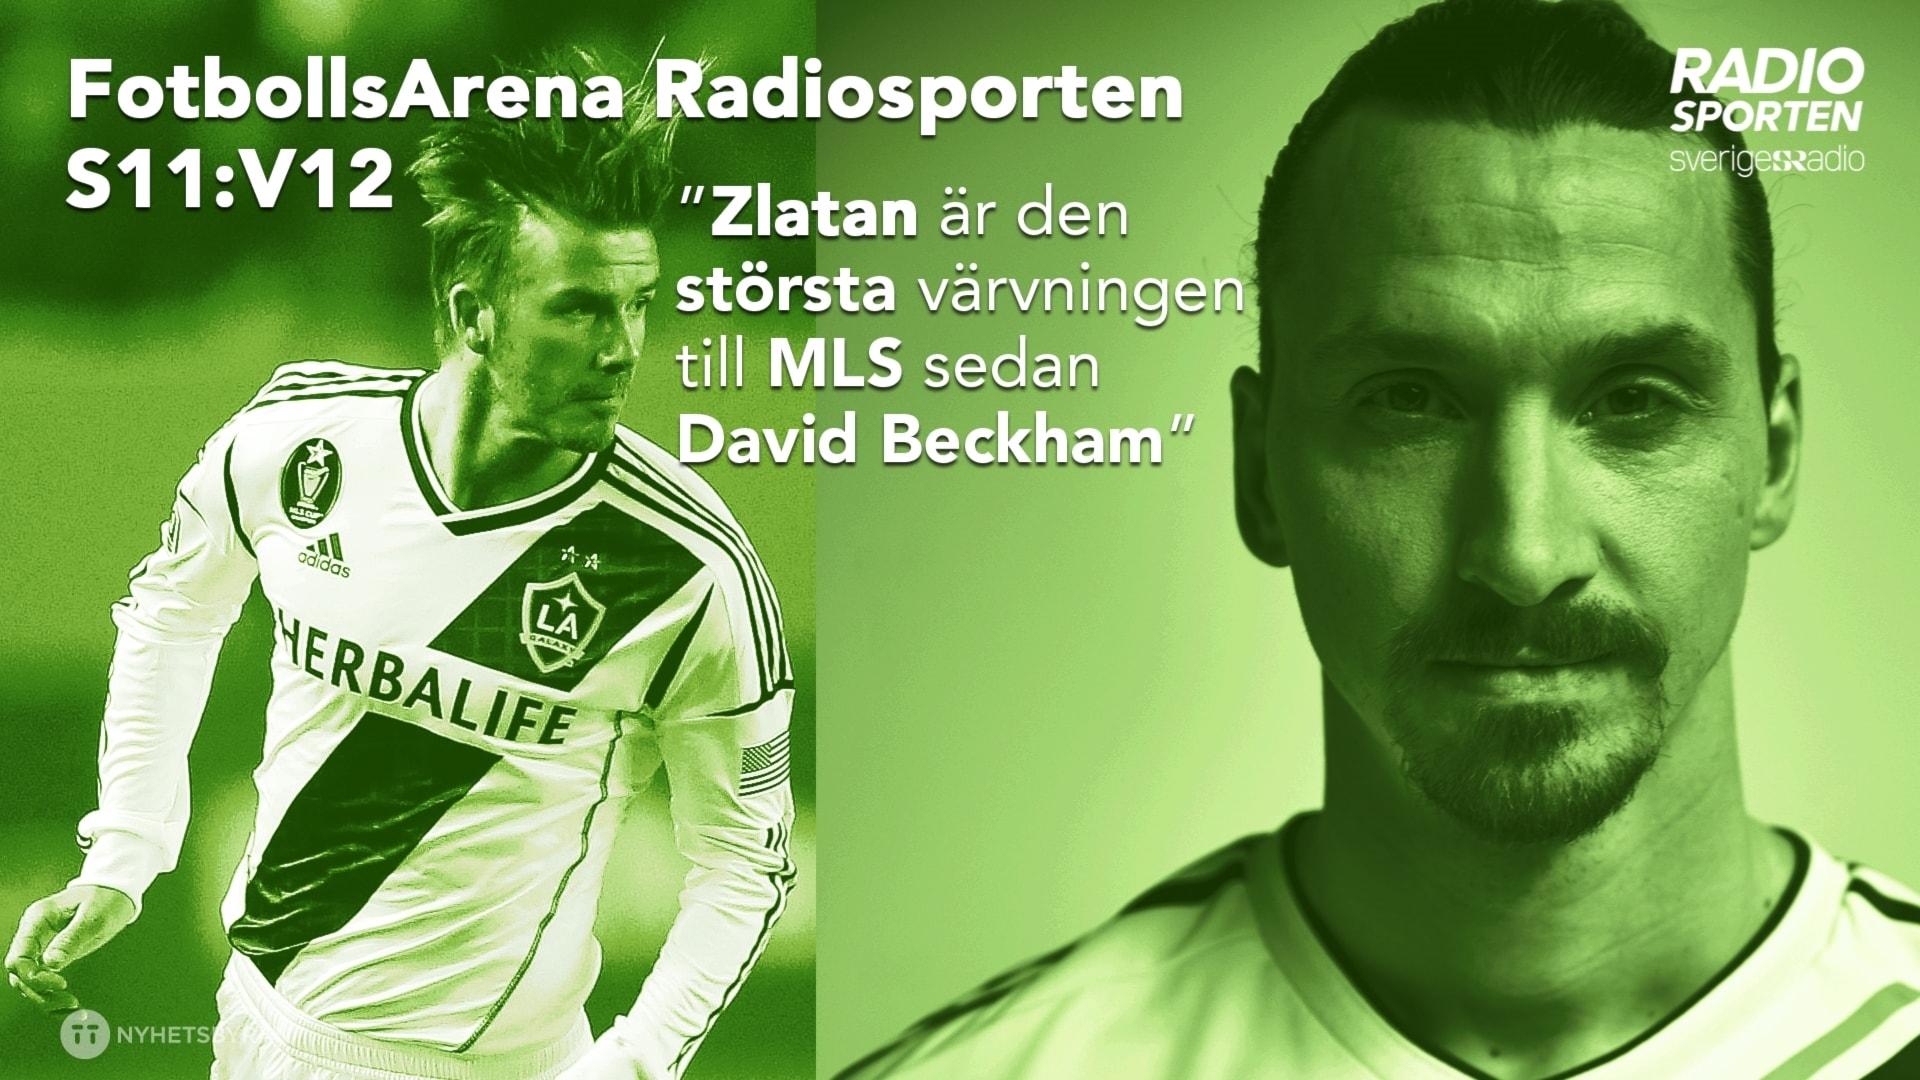 Galaxy-experten: Zlatan är den största sen Beckham